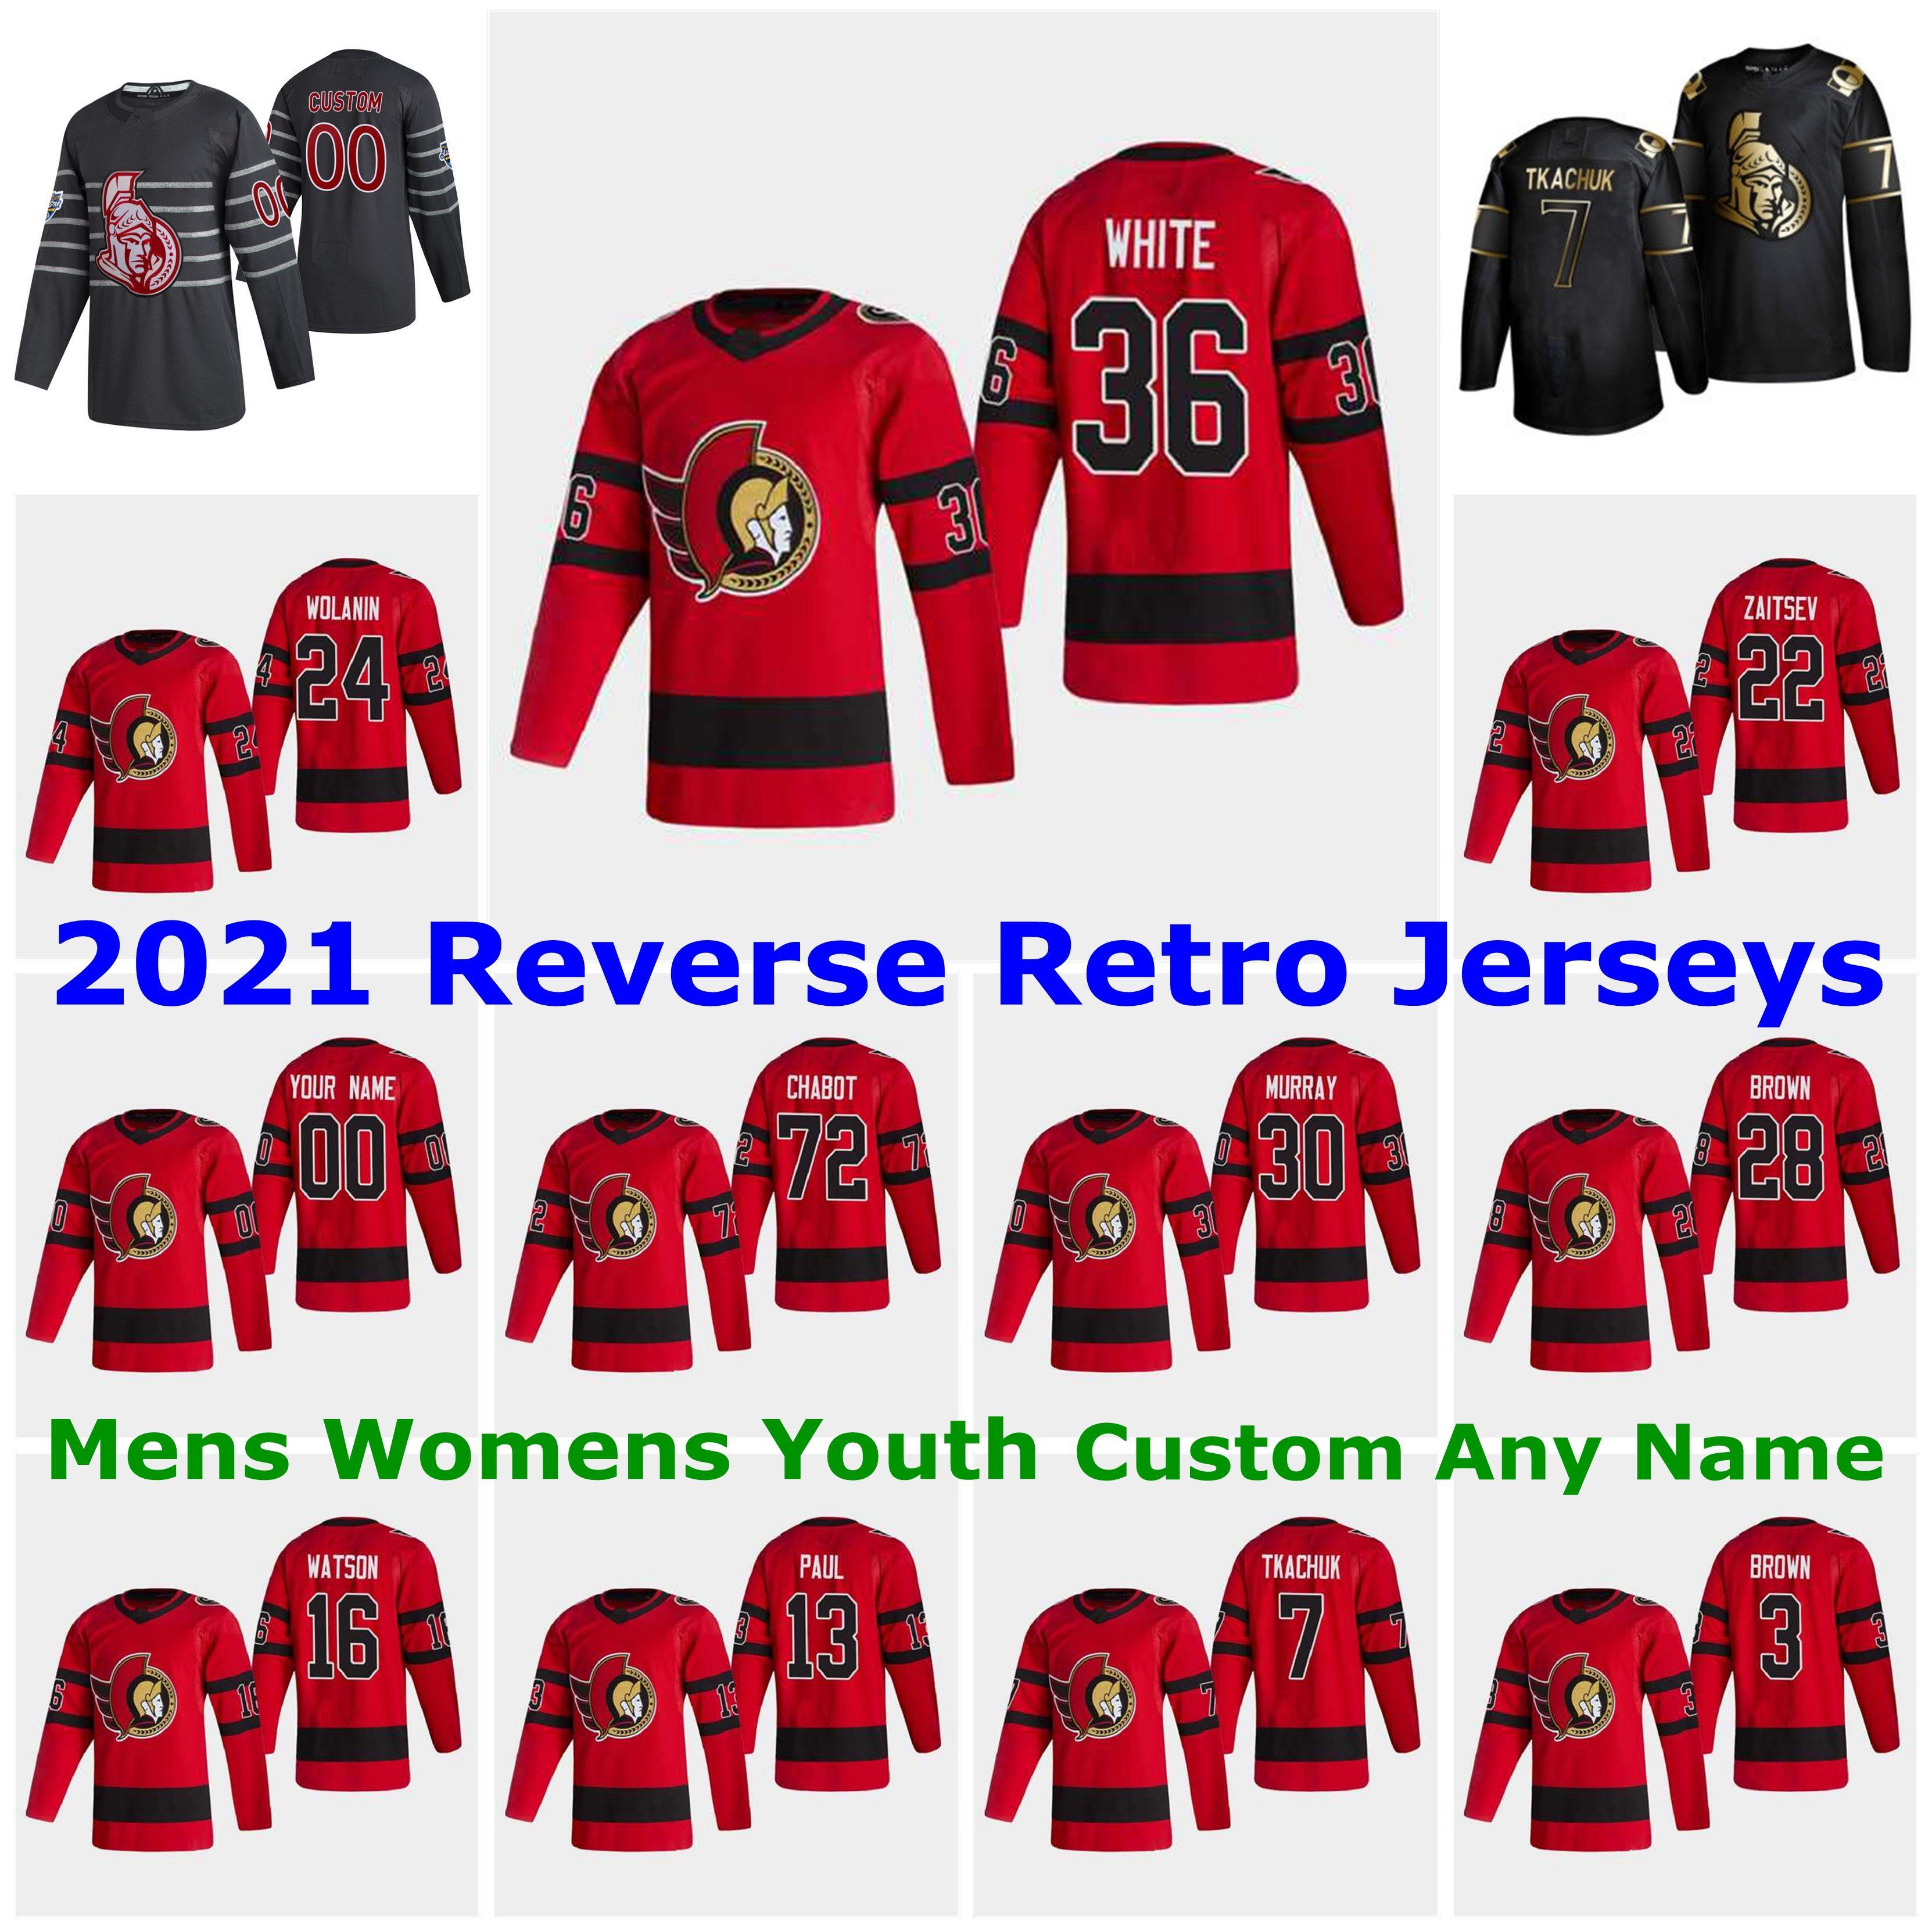 Ottawa Senators 2021 Reverse Retro Jerseys 90 Vladislav Namestnikov Jersey 44 Jean-Gabriel Pageau 13 Nick Paul 9 Bobby Ryan Custom Stitched